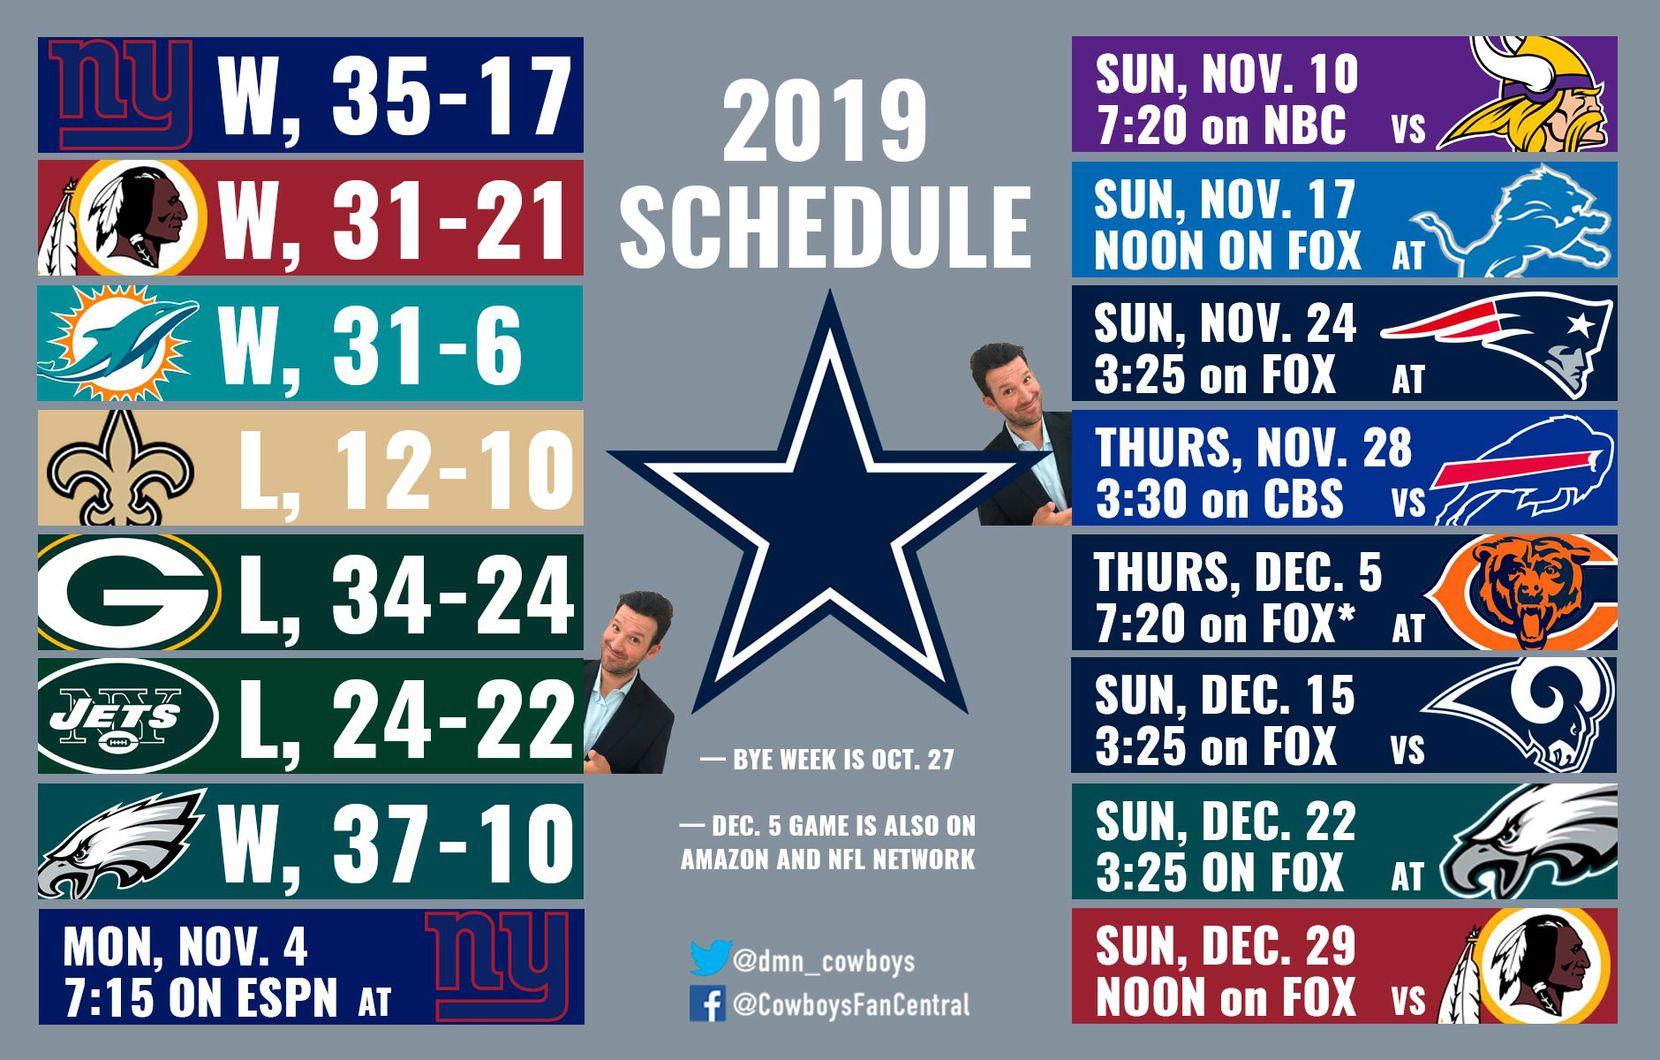 The Dallas Cowboys' 2019 regular-season schedule and results so far.